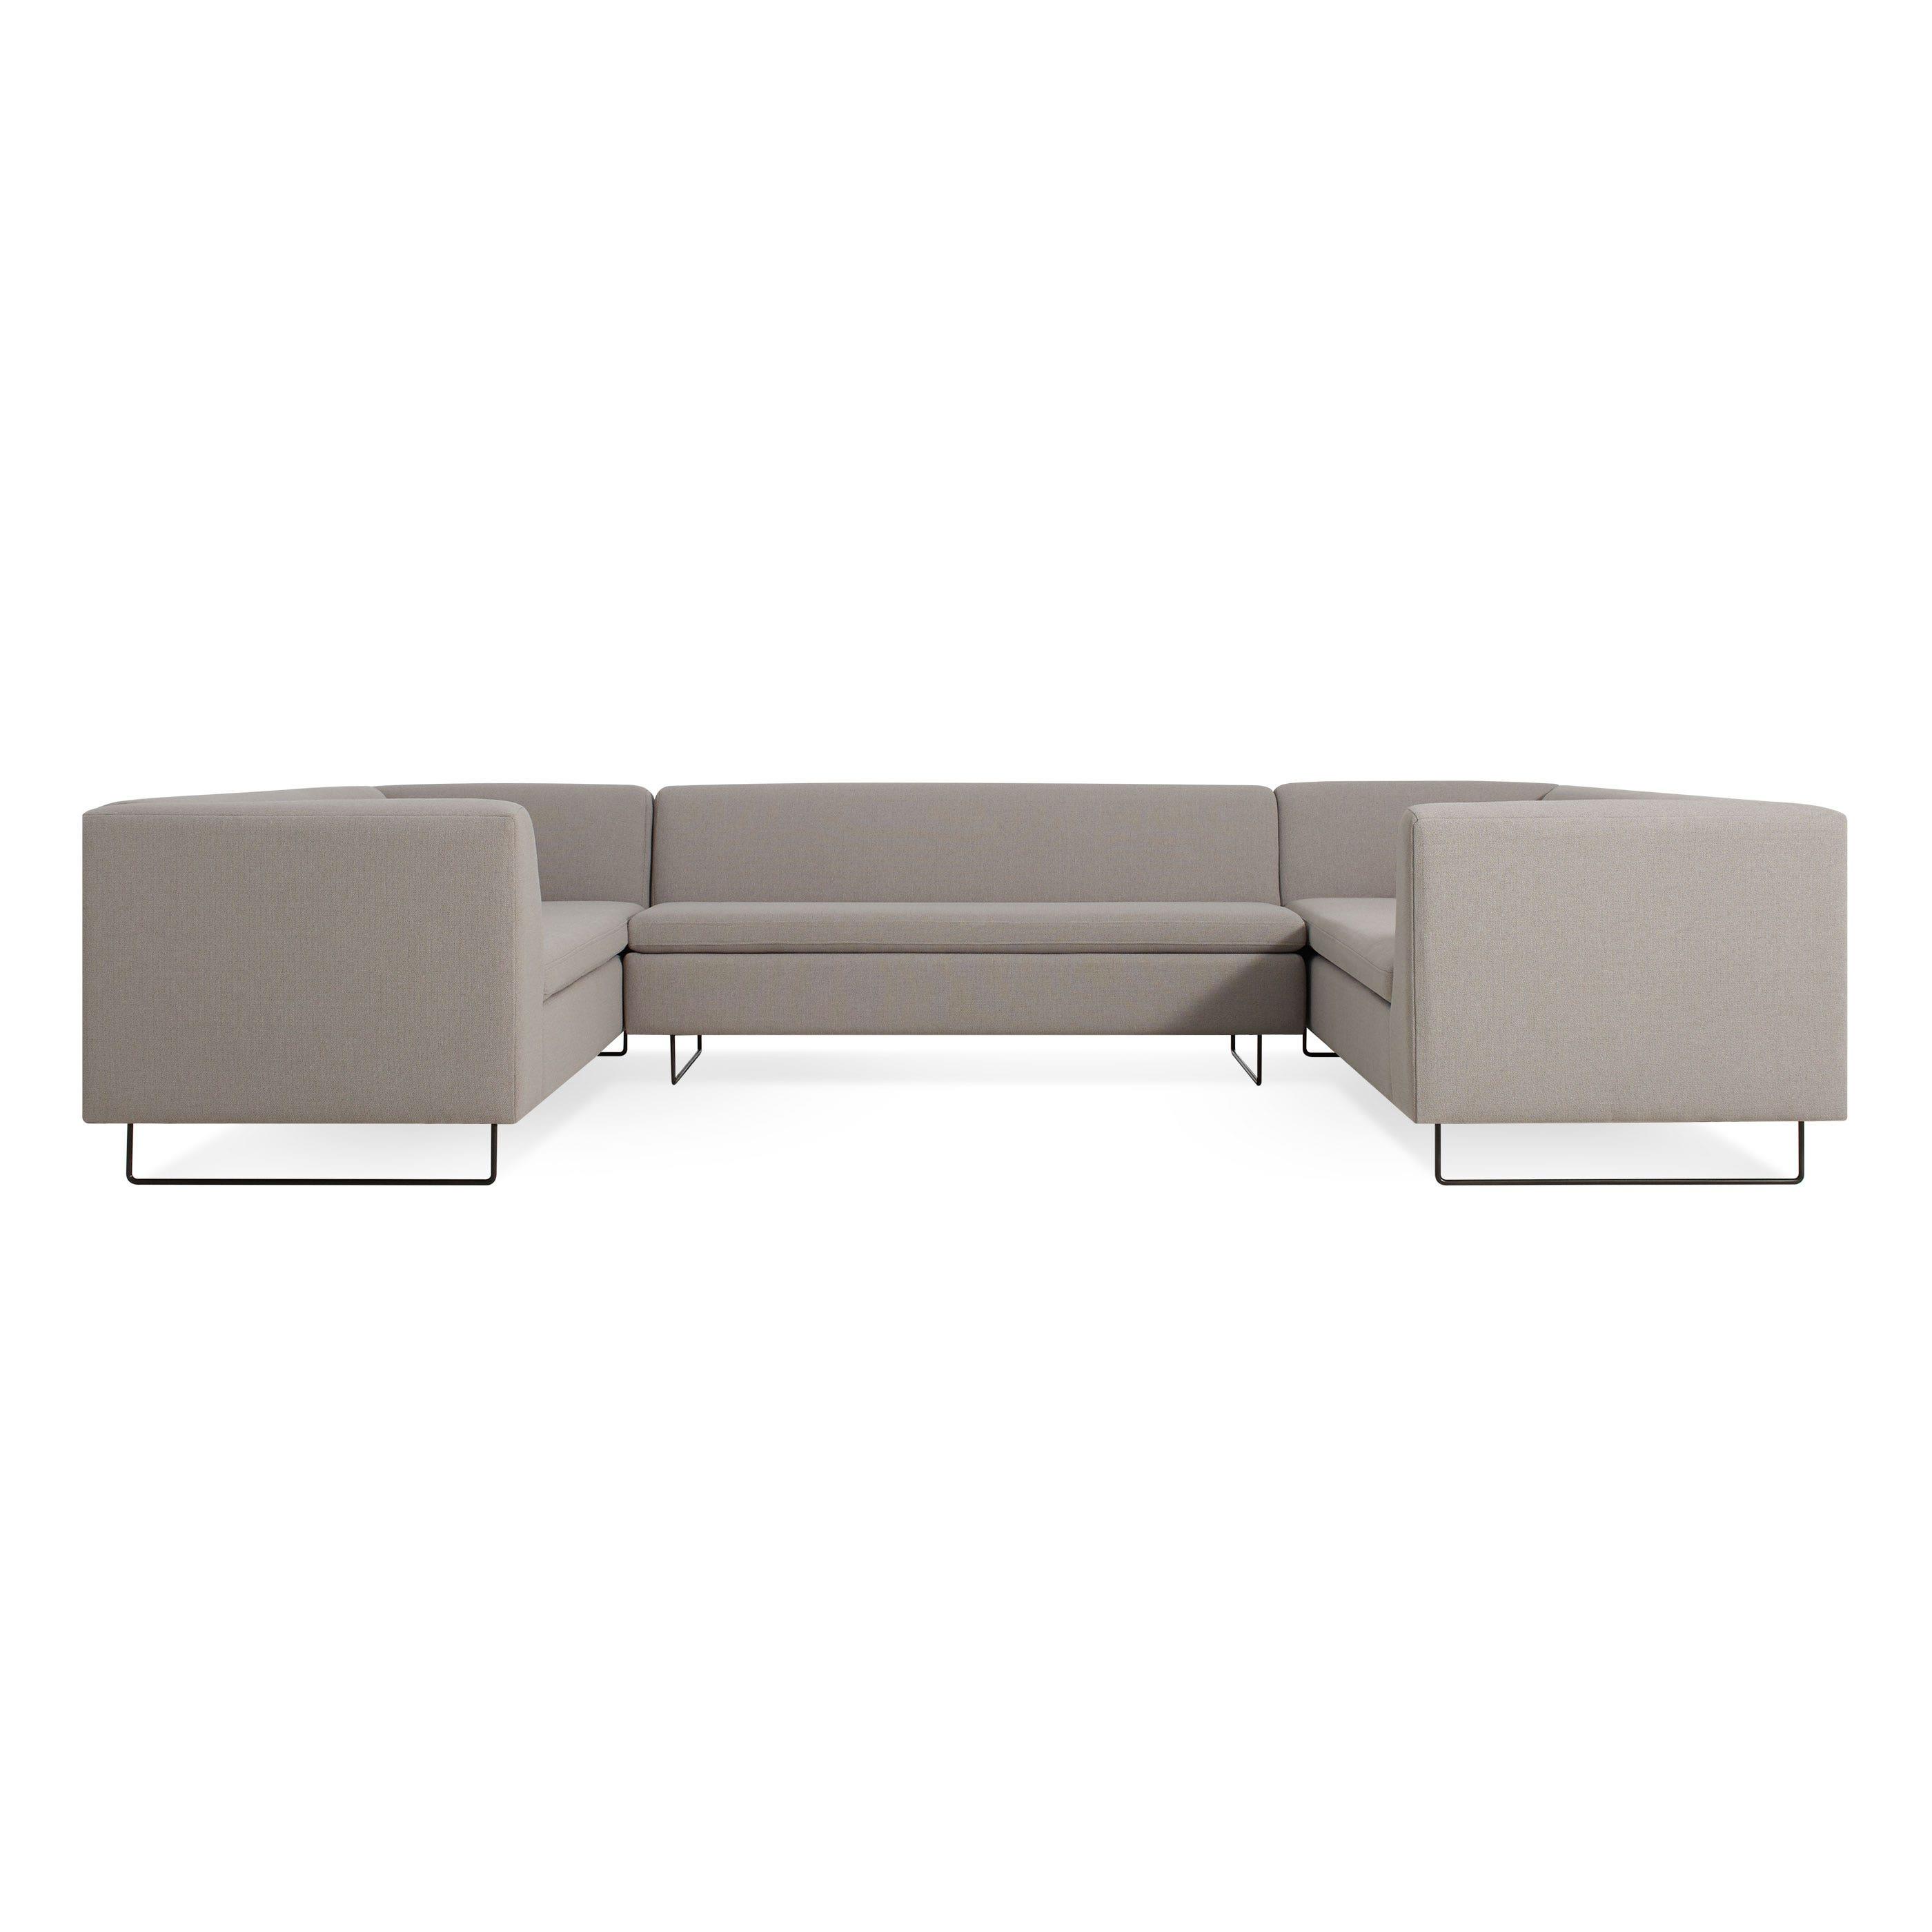 Bonnie & Clyde Modular U Shaped Sectional Sofa